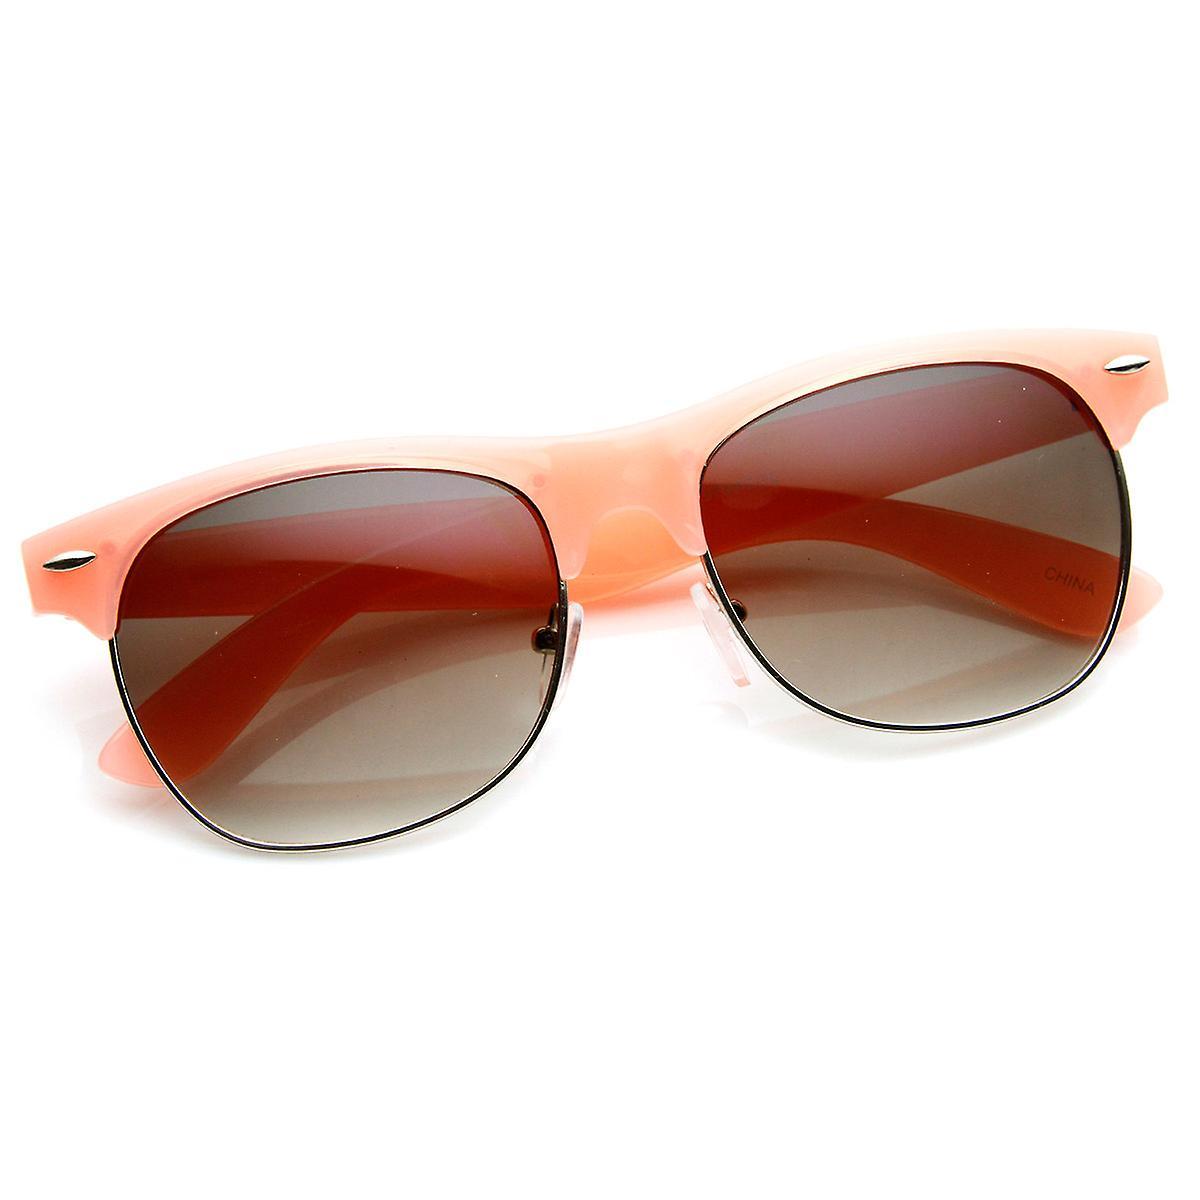 2d20e87c80 Pastel Color Semi-Rimless Half Frame Classic Horn Rimmed Sunglasses ...